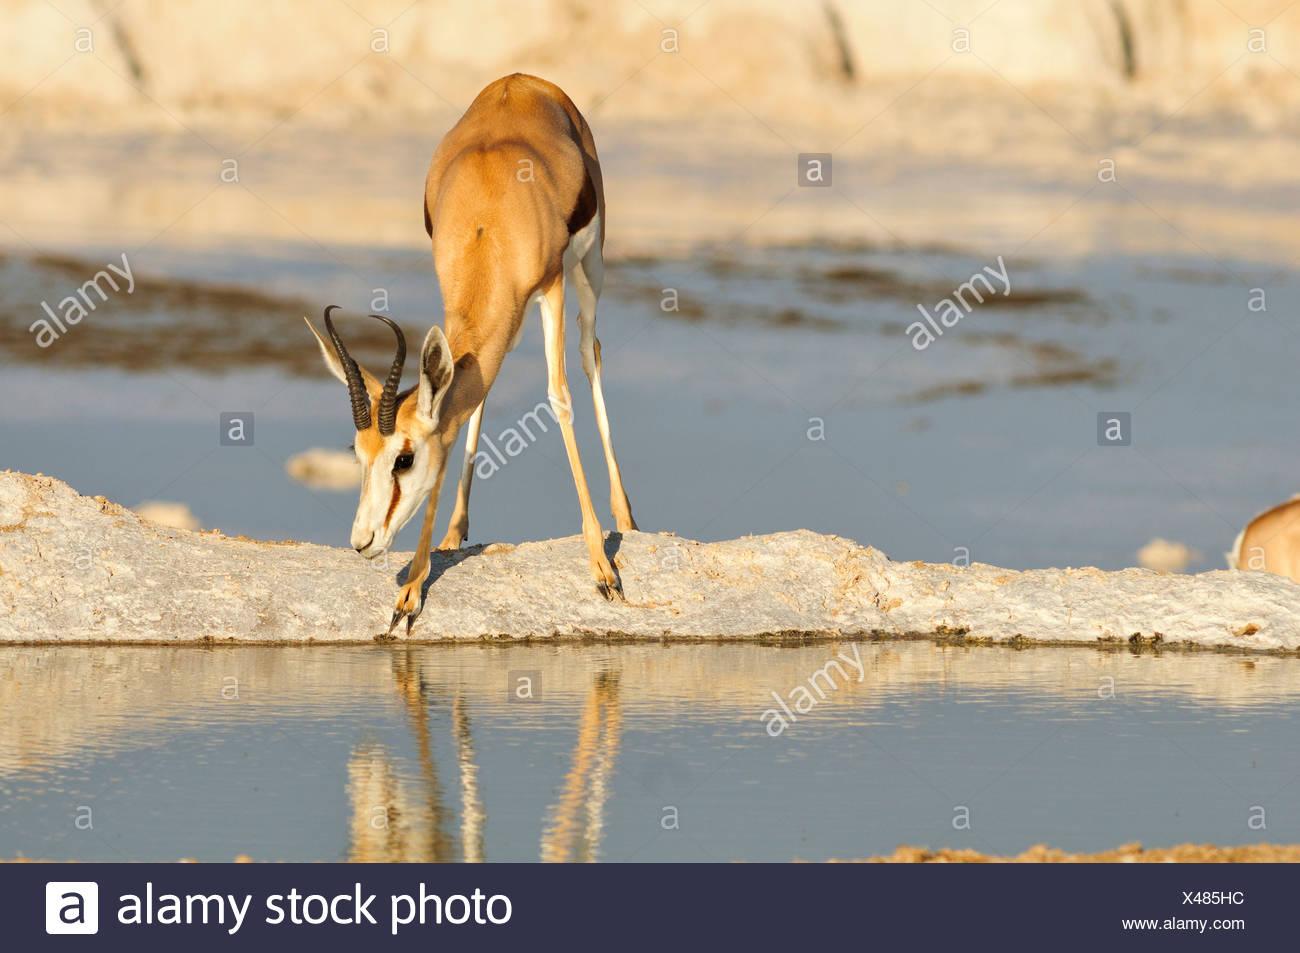 Afrika, Etosha Nationalpark, Namibia, Afrika, Tier, Antilope, Tier, trinken, Horizontal, Ebenen, Reflexion, Safari, Sav Stockbild